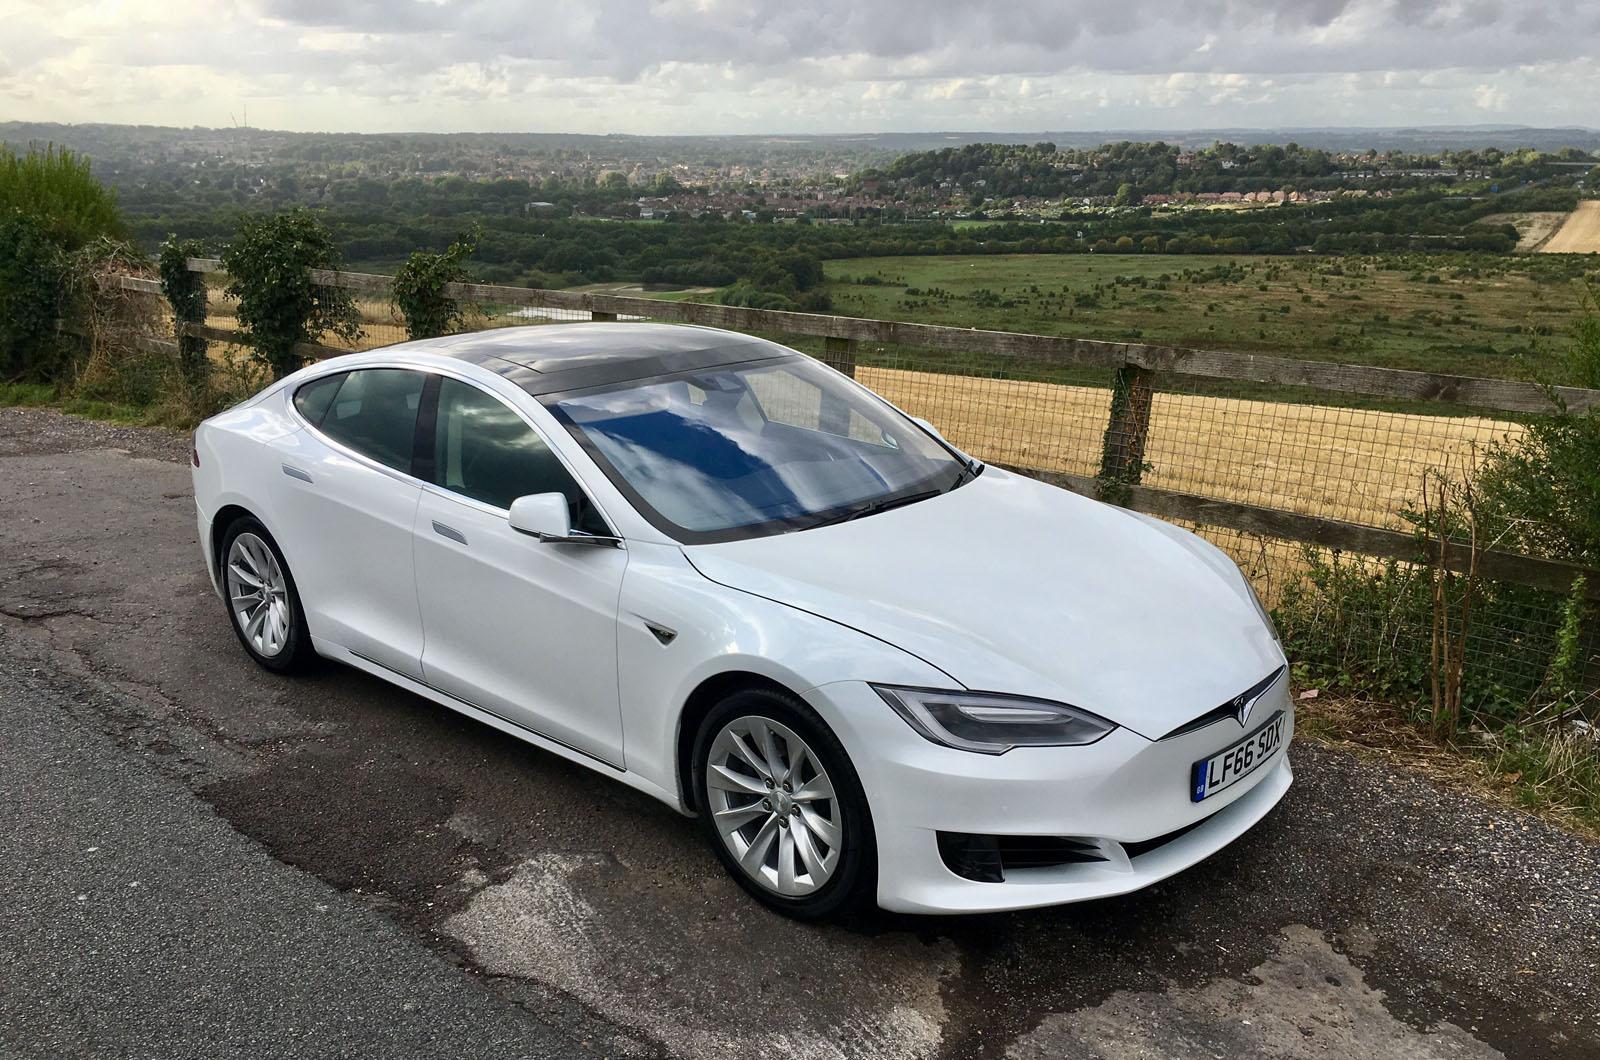 Used Tesla Model S long-termer near Winchester, Hampshire